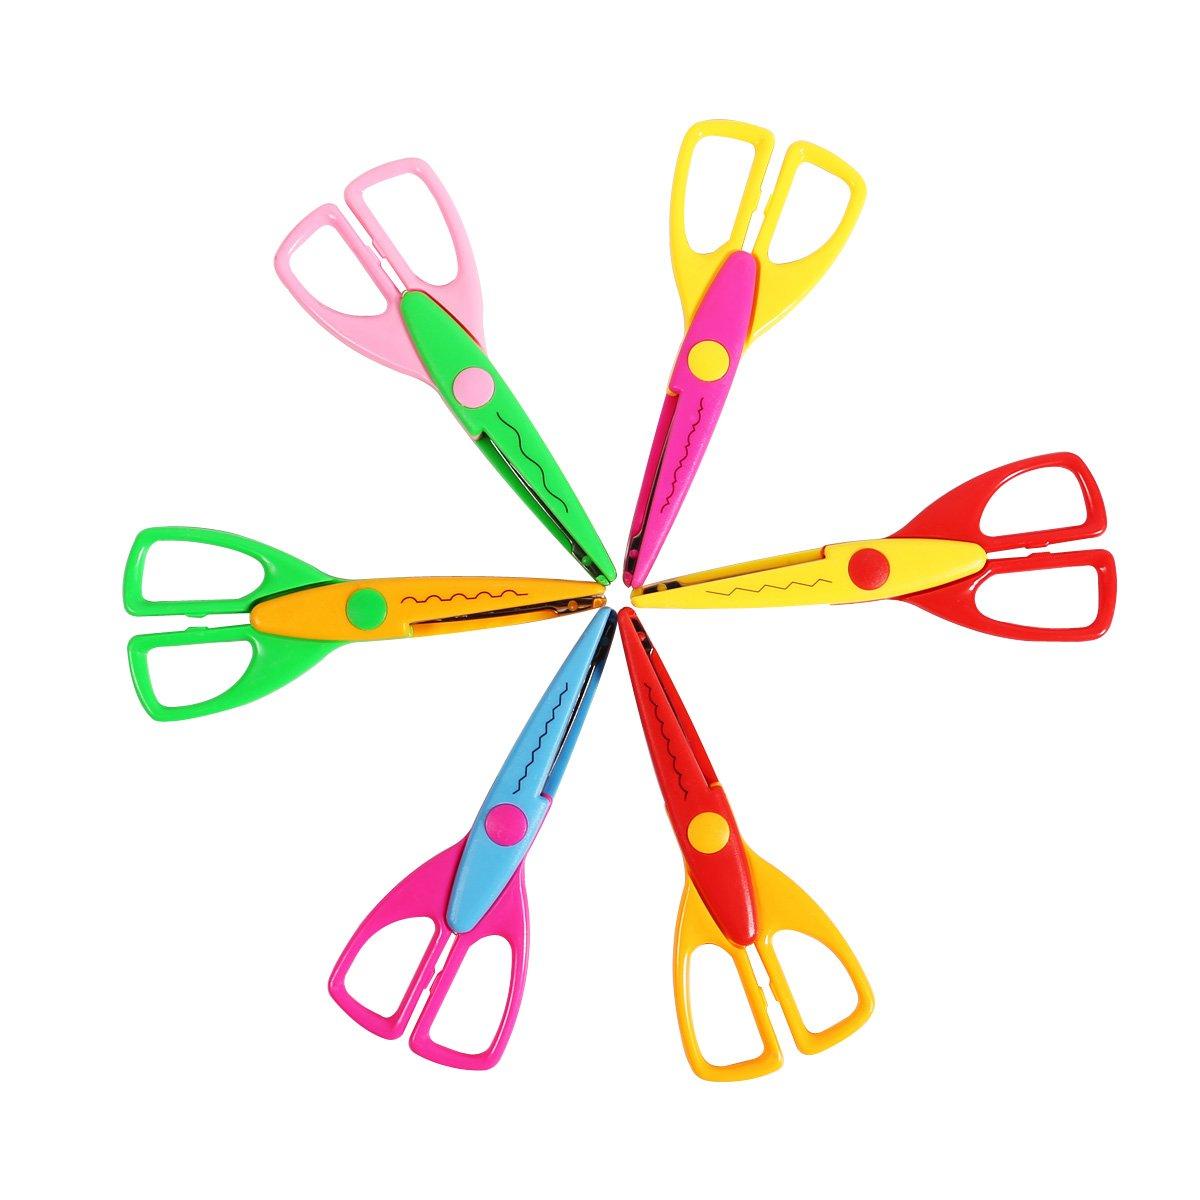 SICOHOME Scrapbooking Decorative Edger Paper Scissors Kids,Set of 6